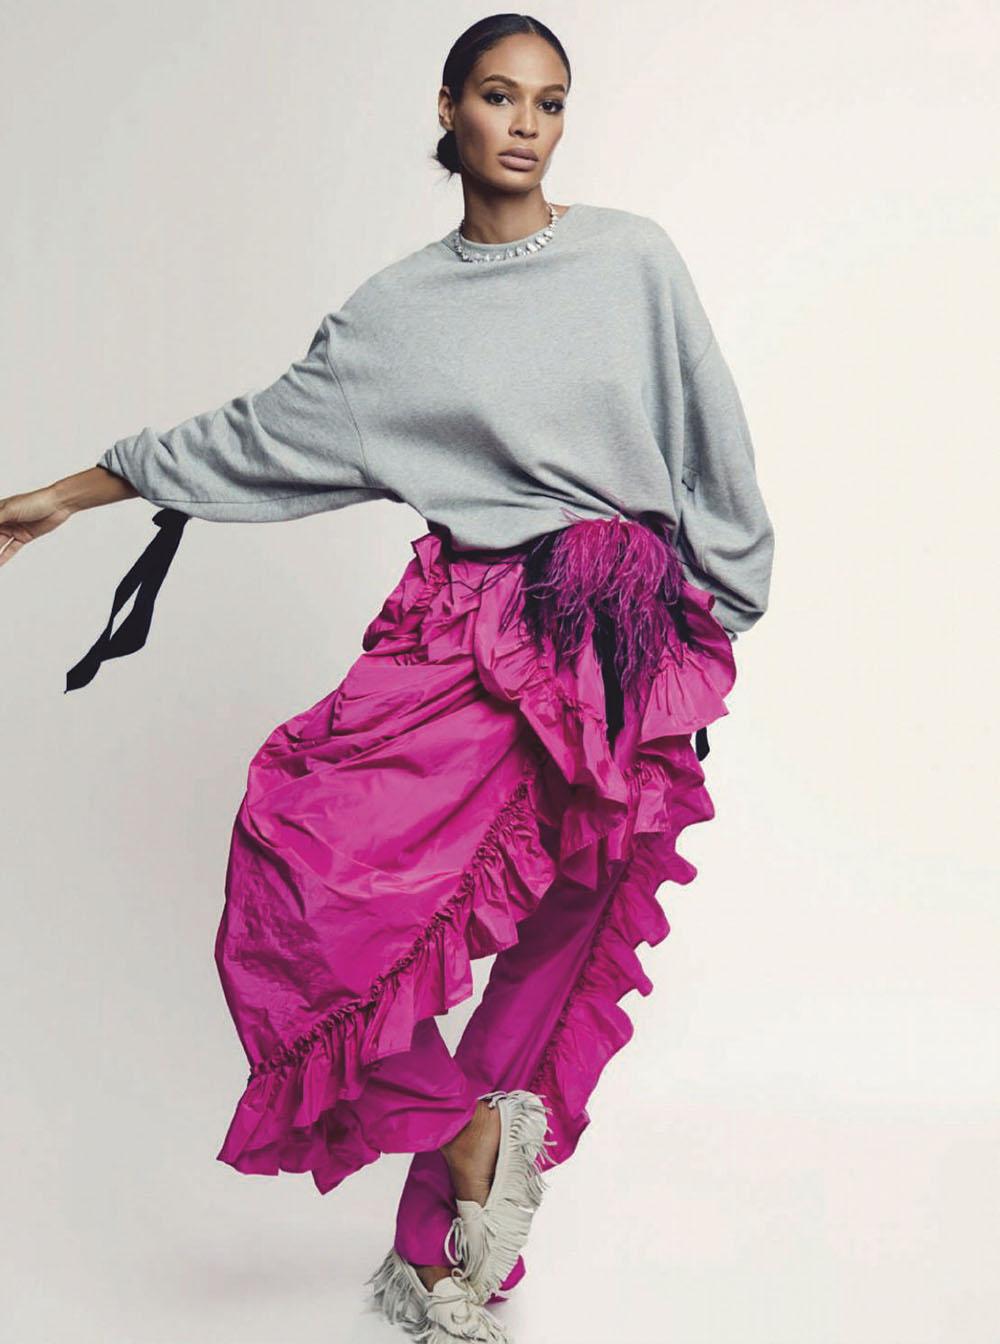 Joan Smalls covers Harper's Bazaar Spain February 2020 by Xavi Gordo